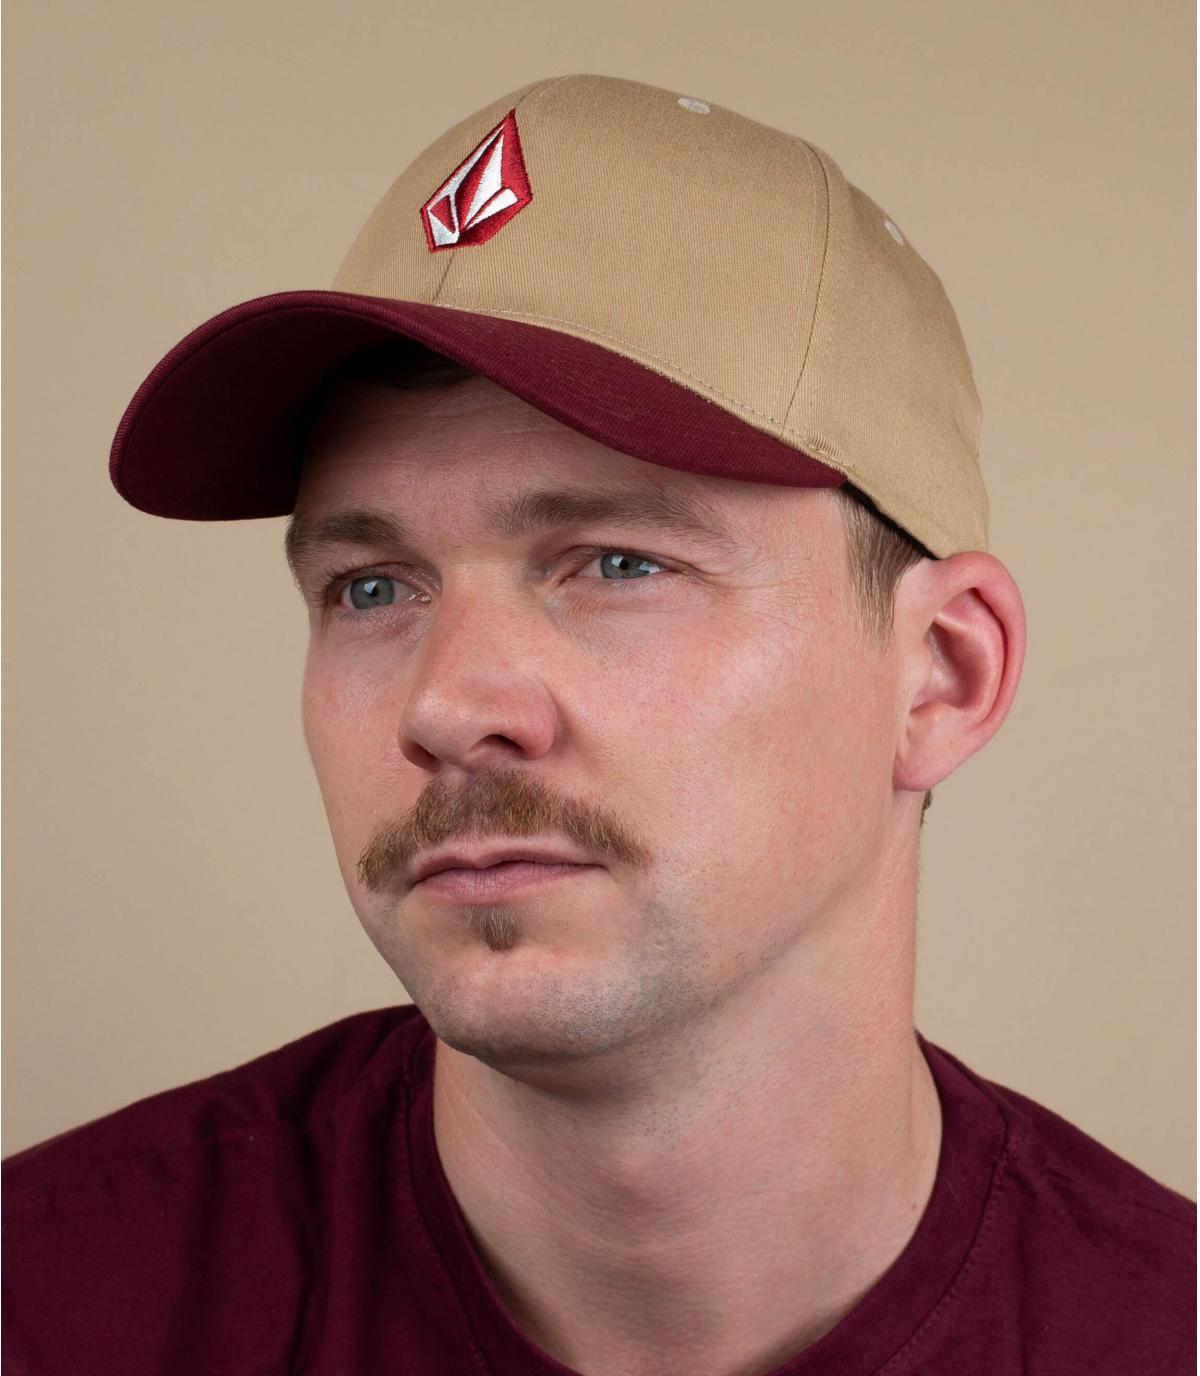 cappello Volcom bordeaux beige